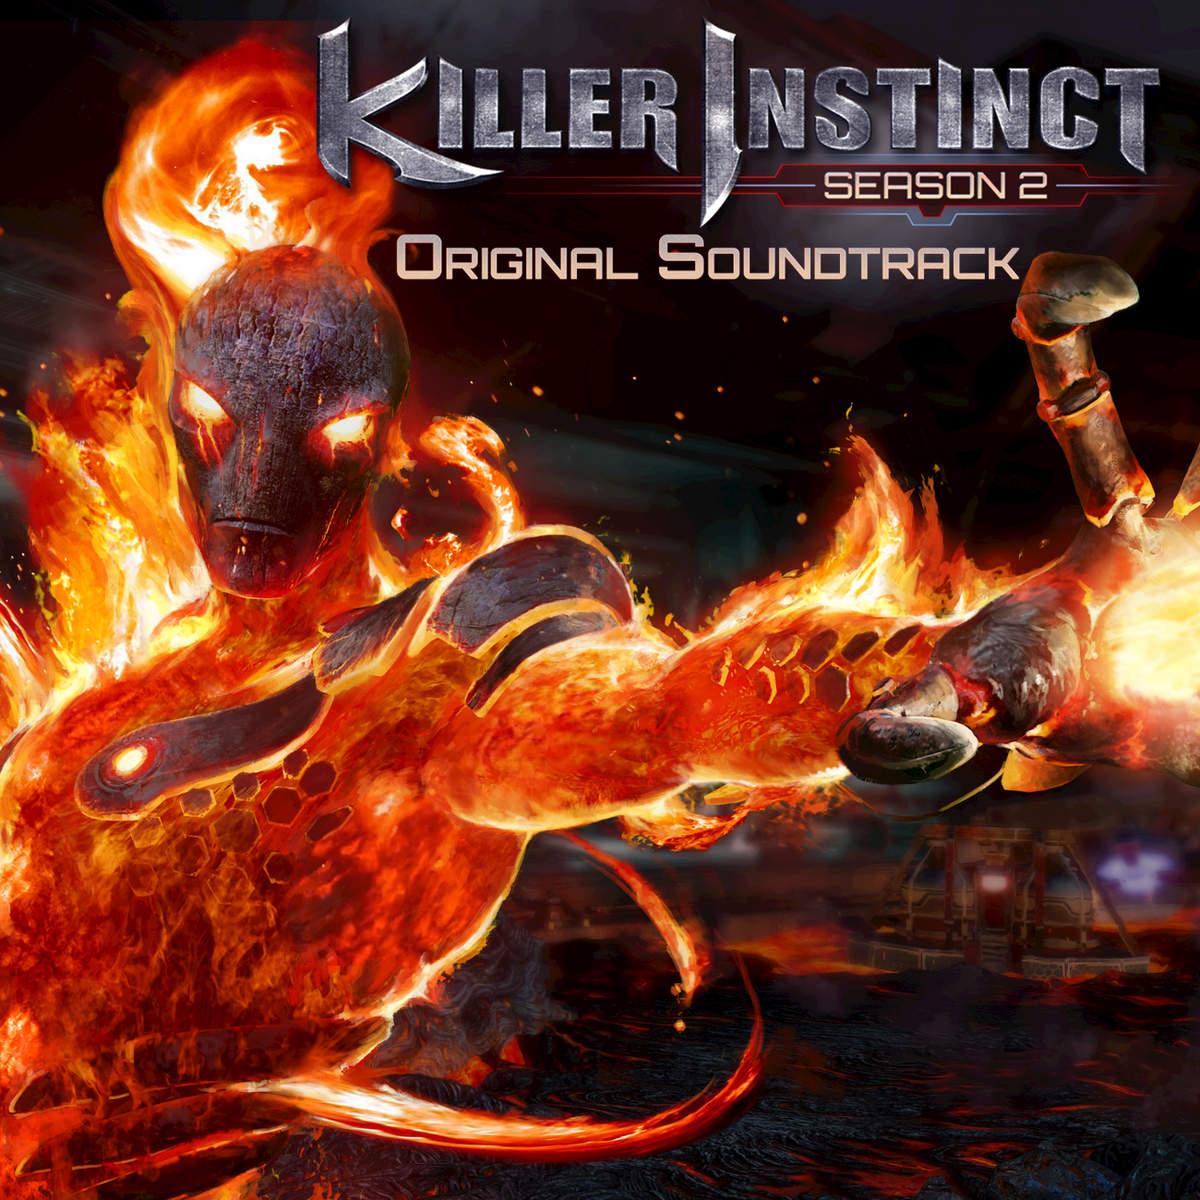 Killer-Instinct_Season_2_Original_Soundtrack__cover1200x1200.jpg